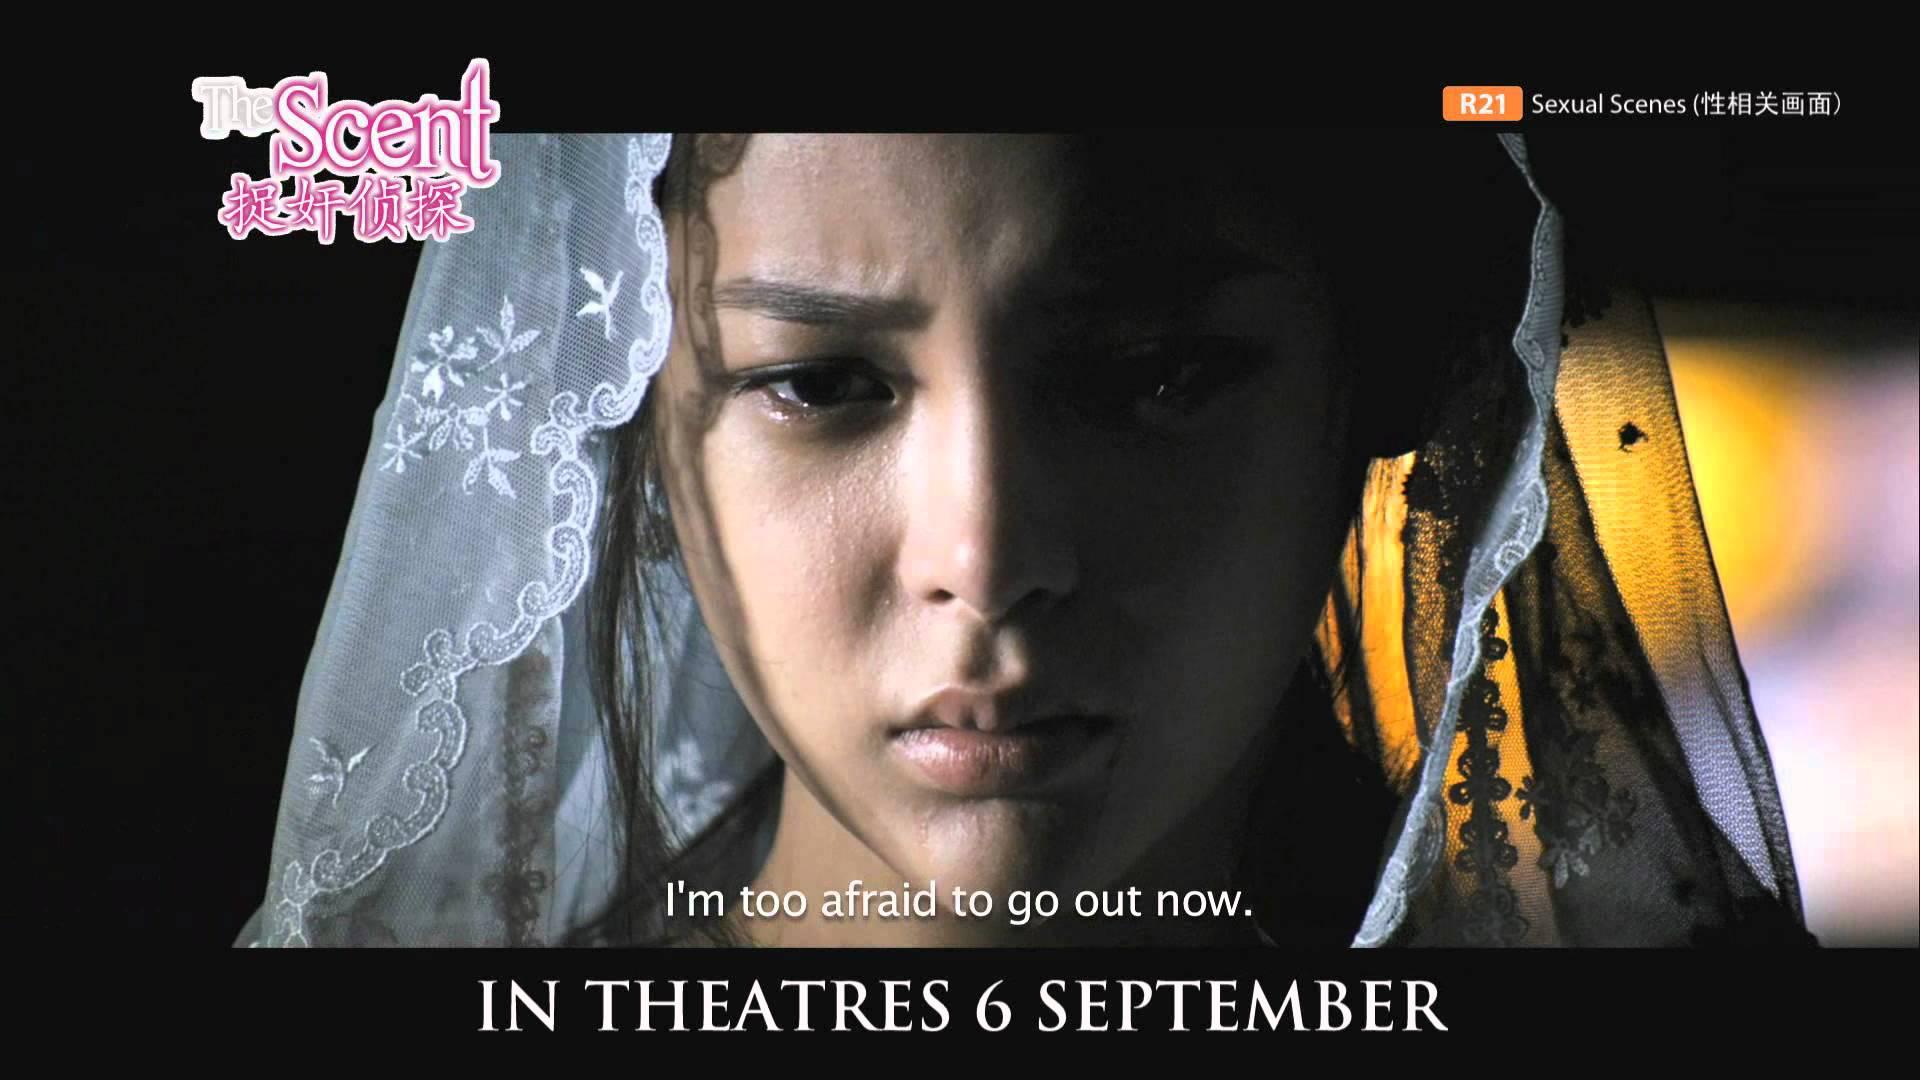 Korean R21 Movie: The Scent (捉奸侦探) - Alvinology